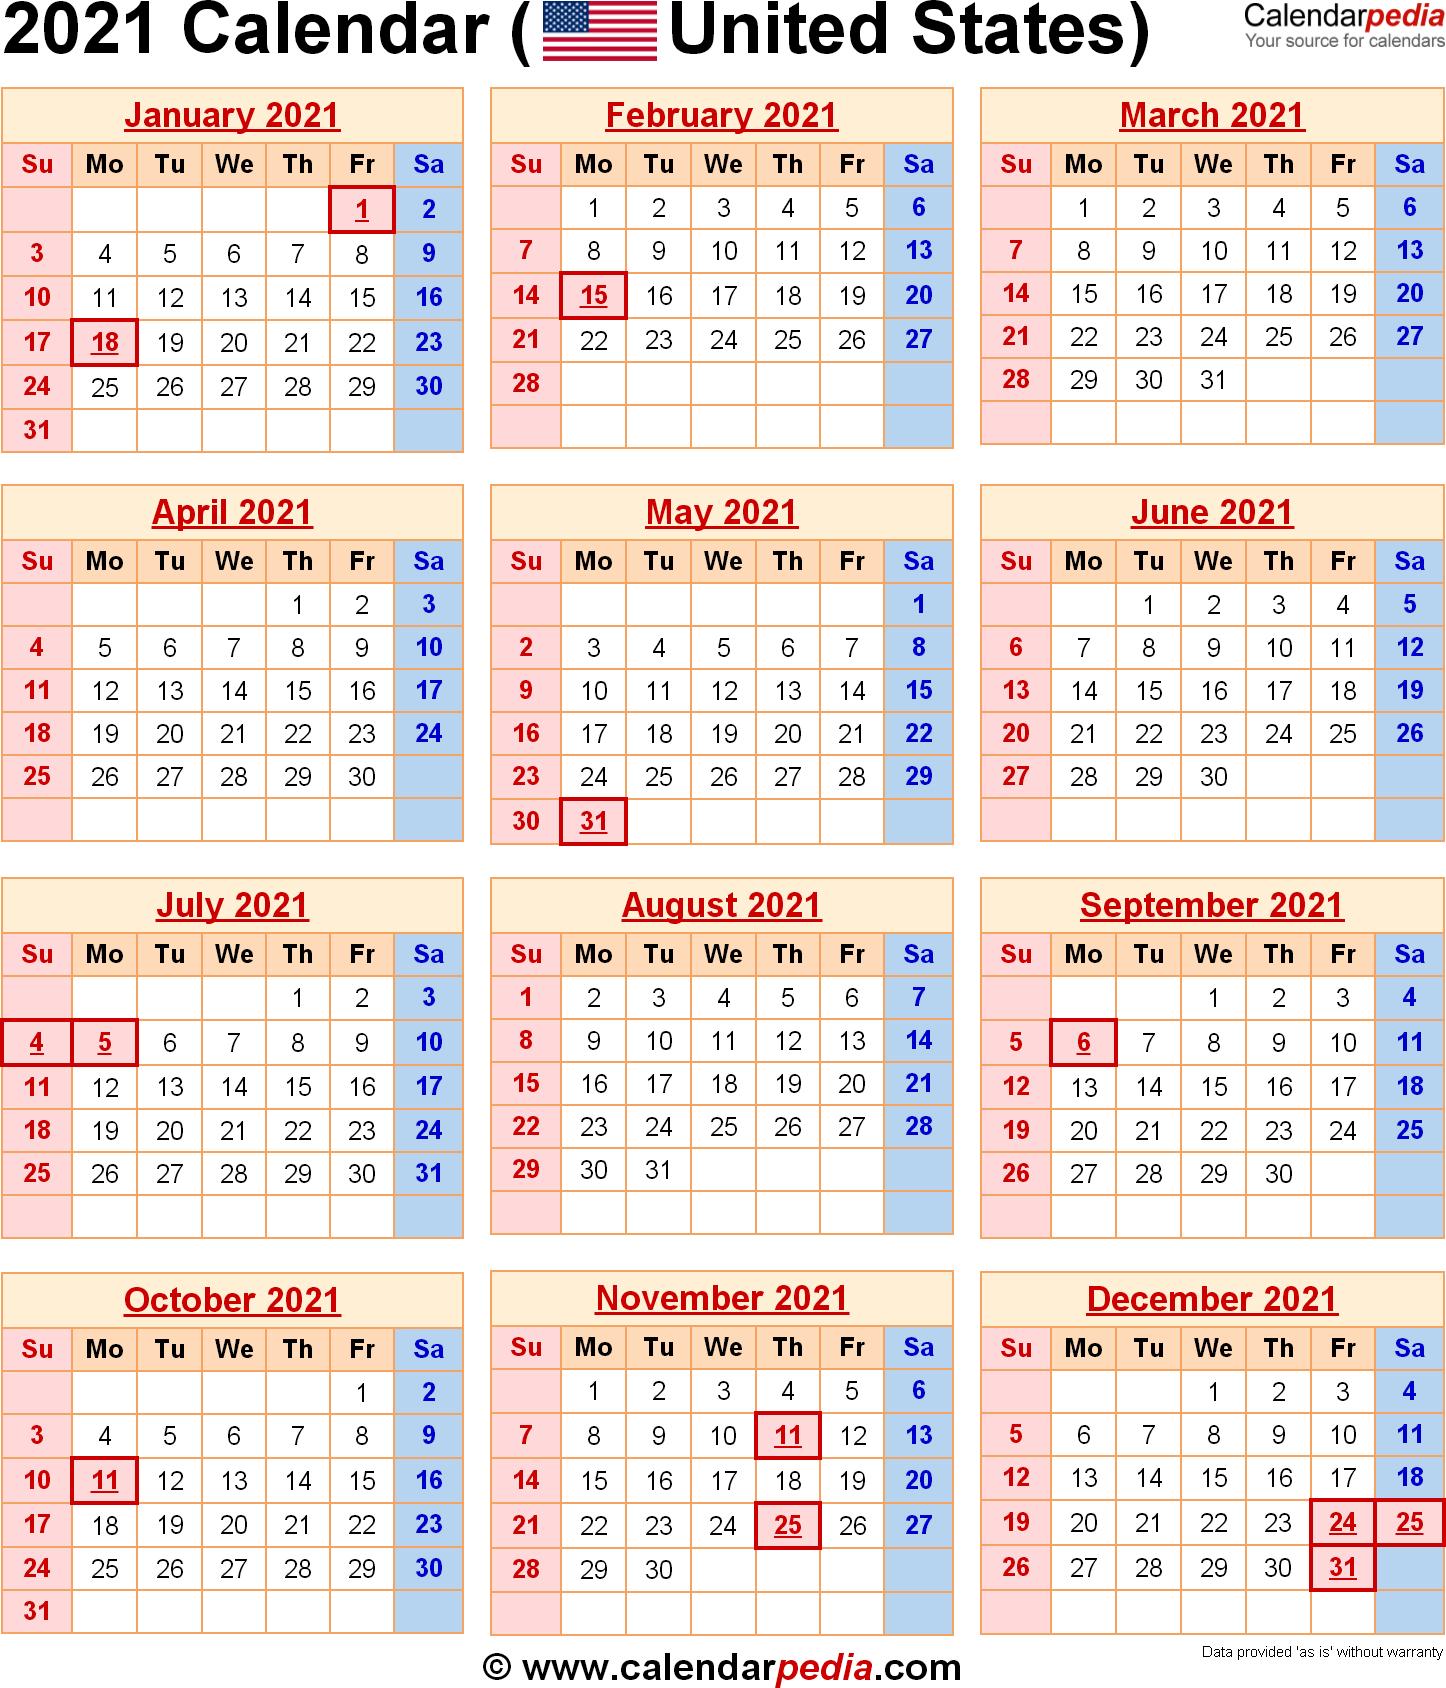 2021 Calendar With Federal Holidays